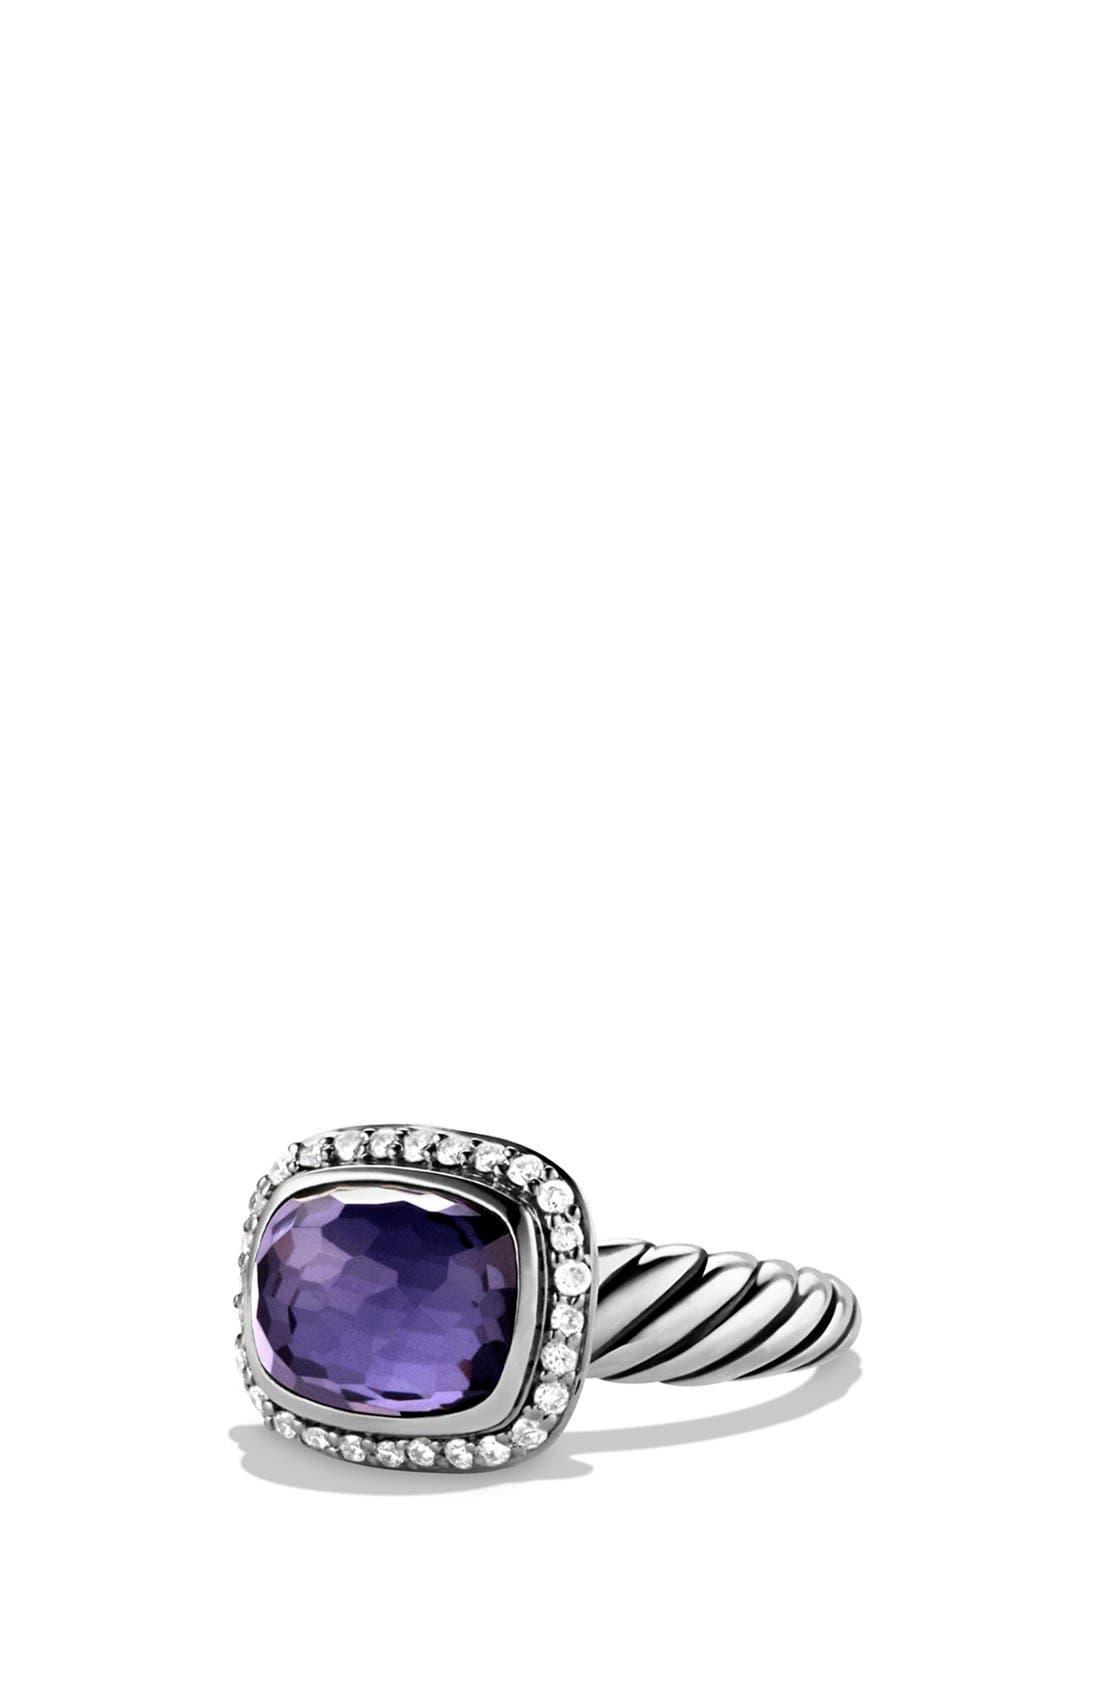 Main Image - David Yurman 'Noblesse' Ring with Diamonds